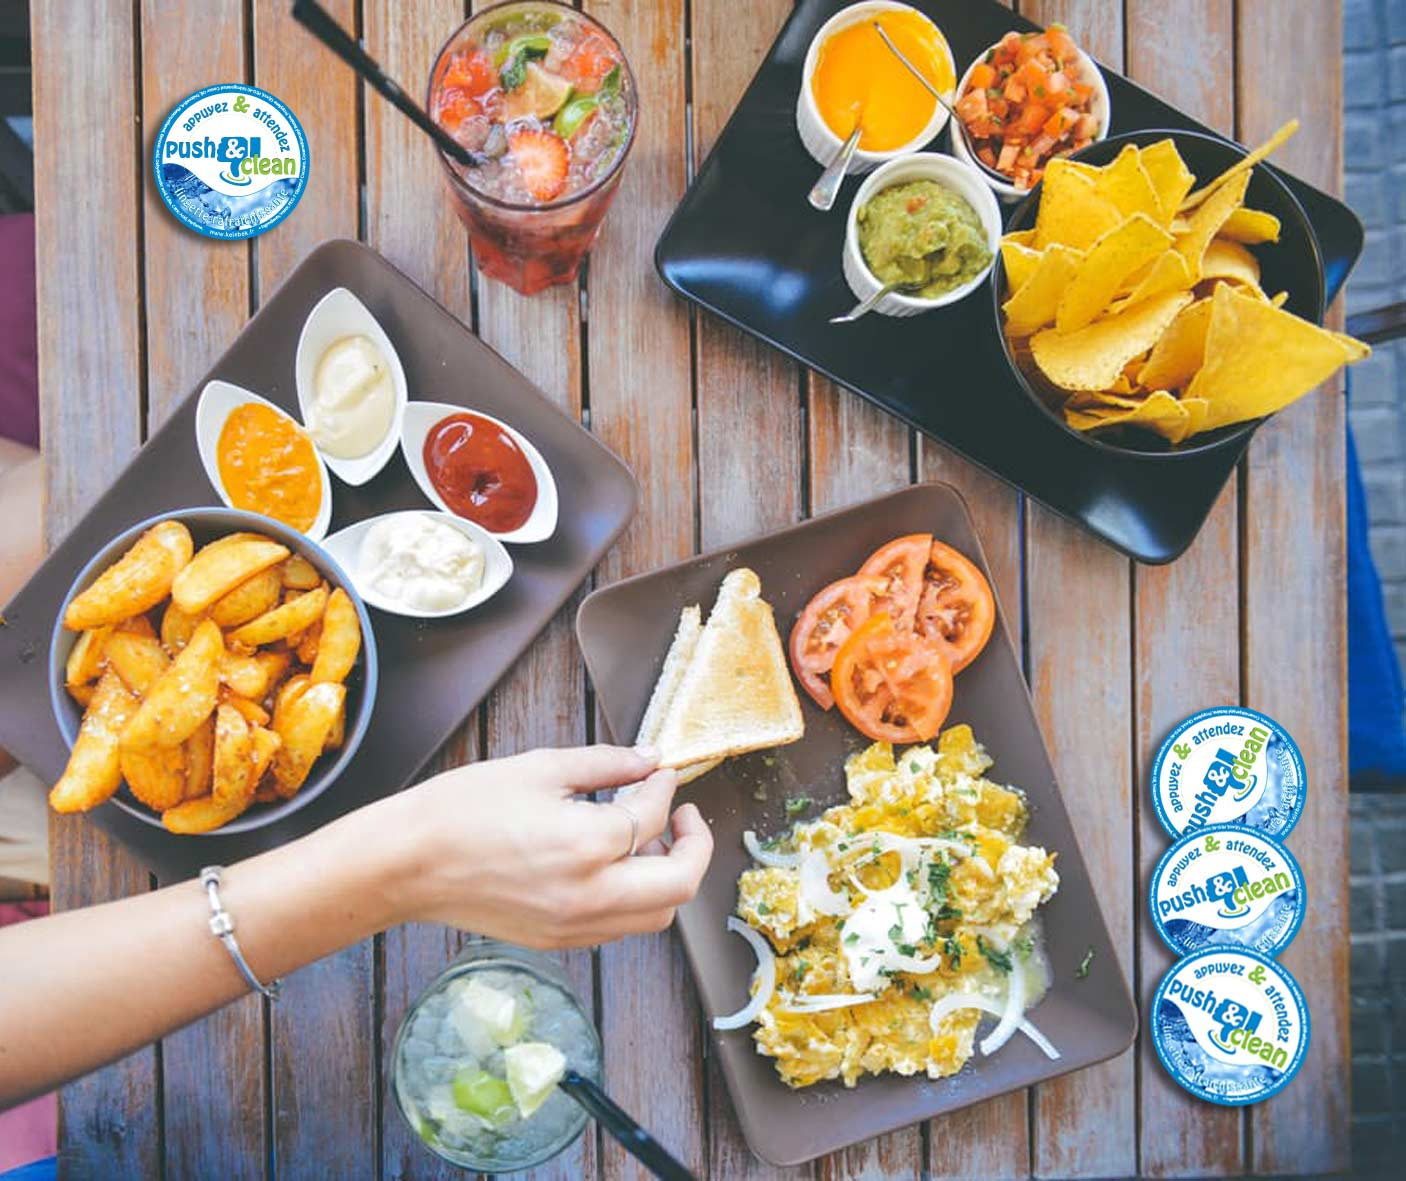 Food salad restaurant pushclean